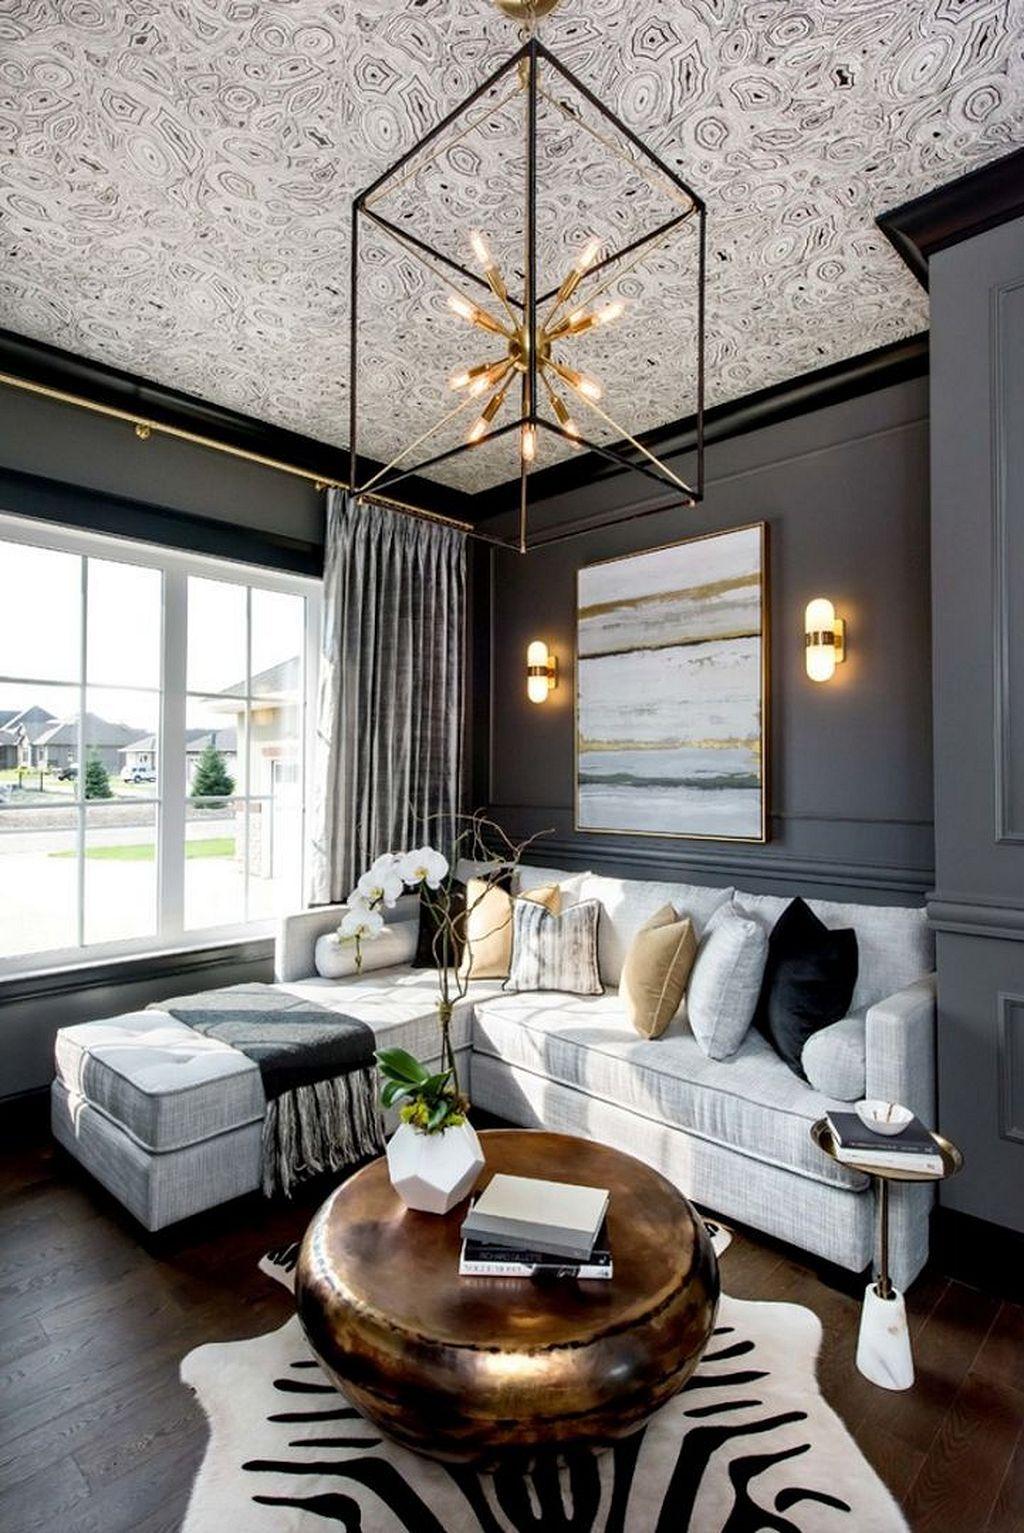 Cool 100 Transitional Living Room Decor Ideas Https Kidmagz Com 100 T Apartment Living Room Design Transitional Living Room Design Transitional Living Rooms